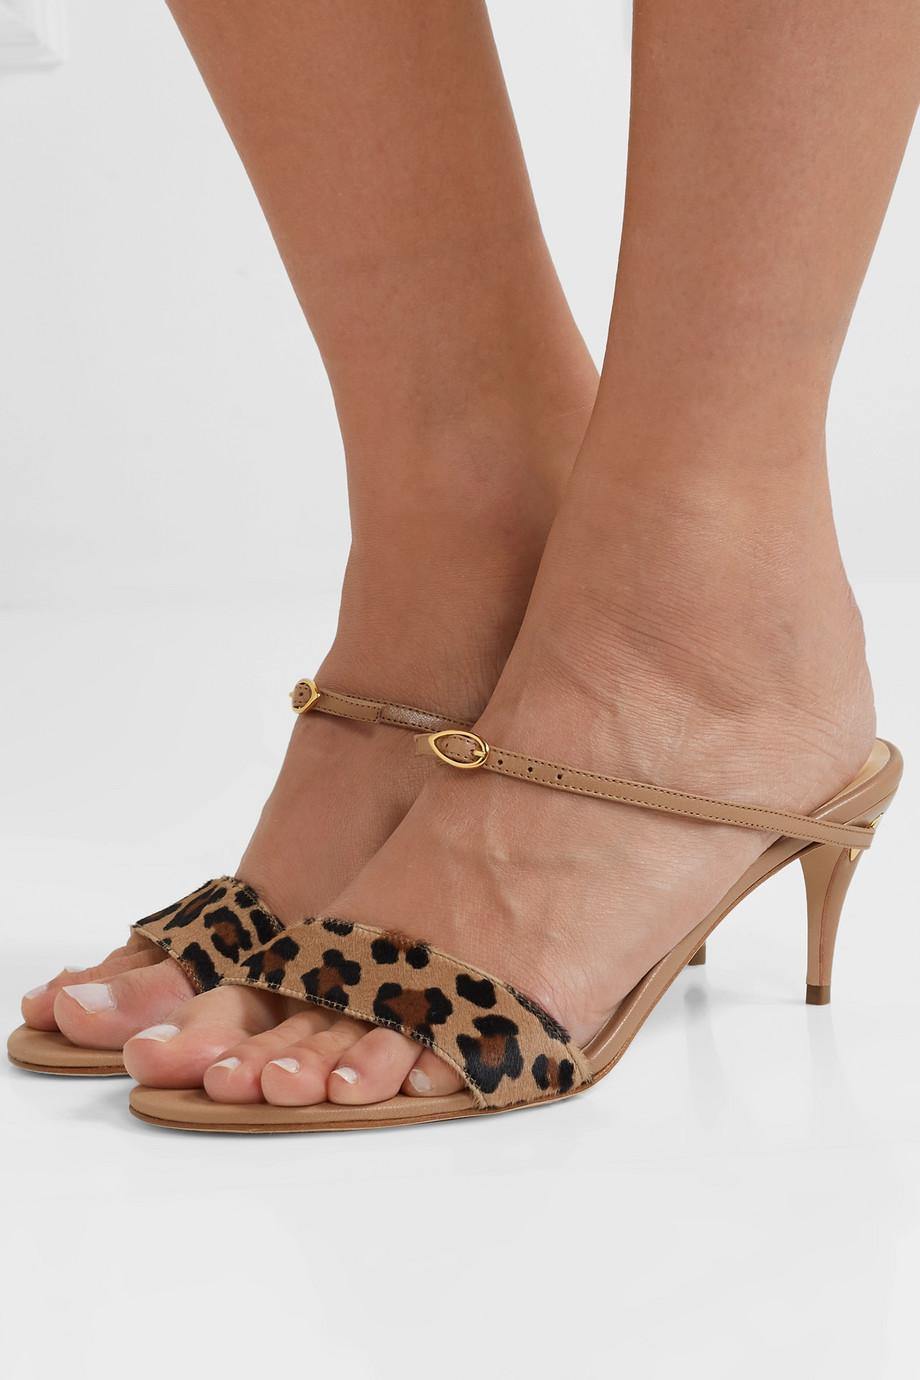 Jennifer Chamandi Andrea leopard-print calf hair and leather sandals